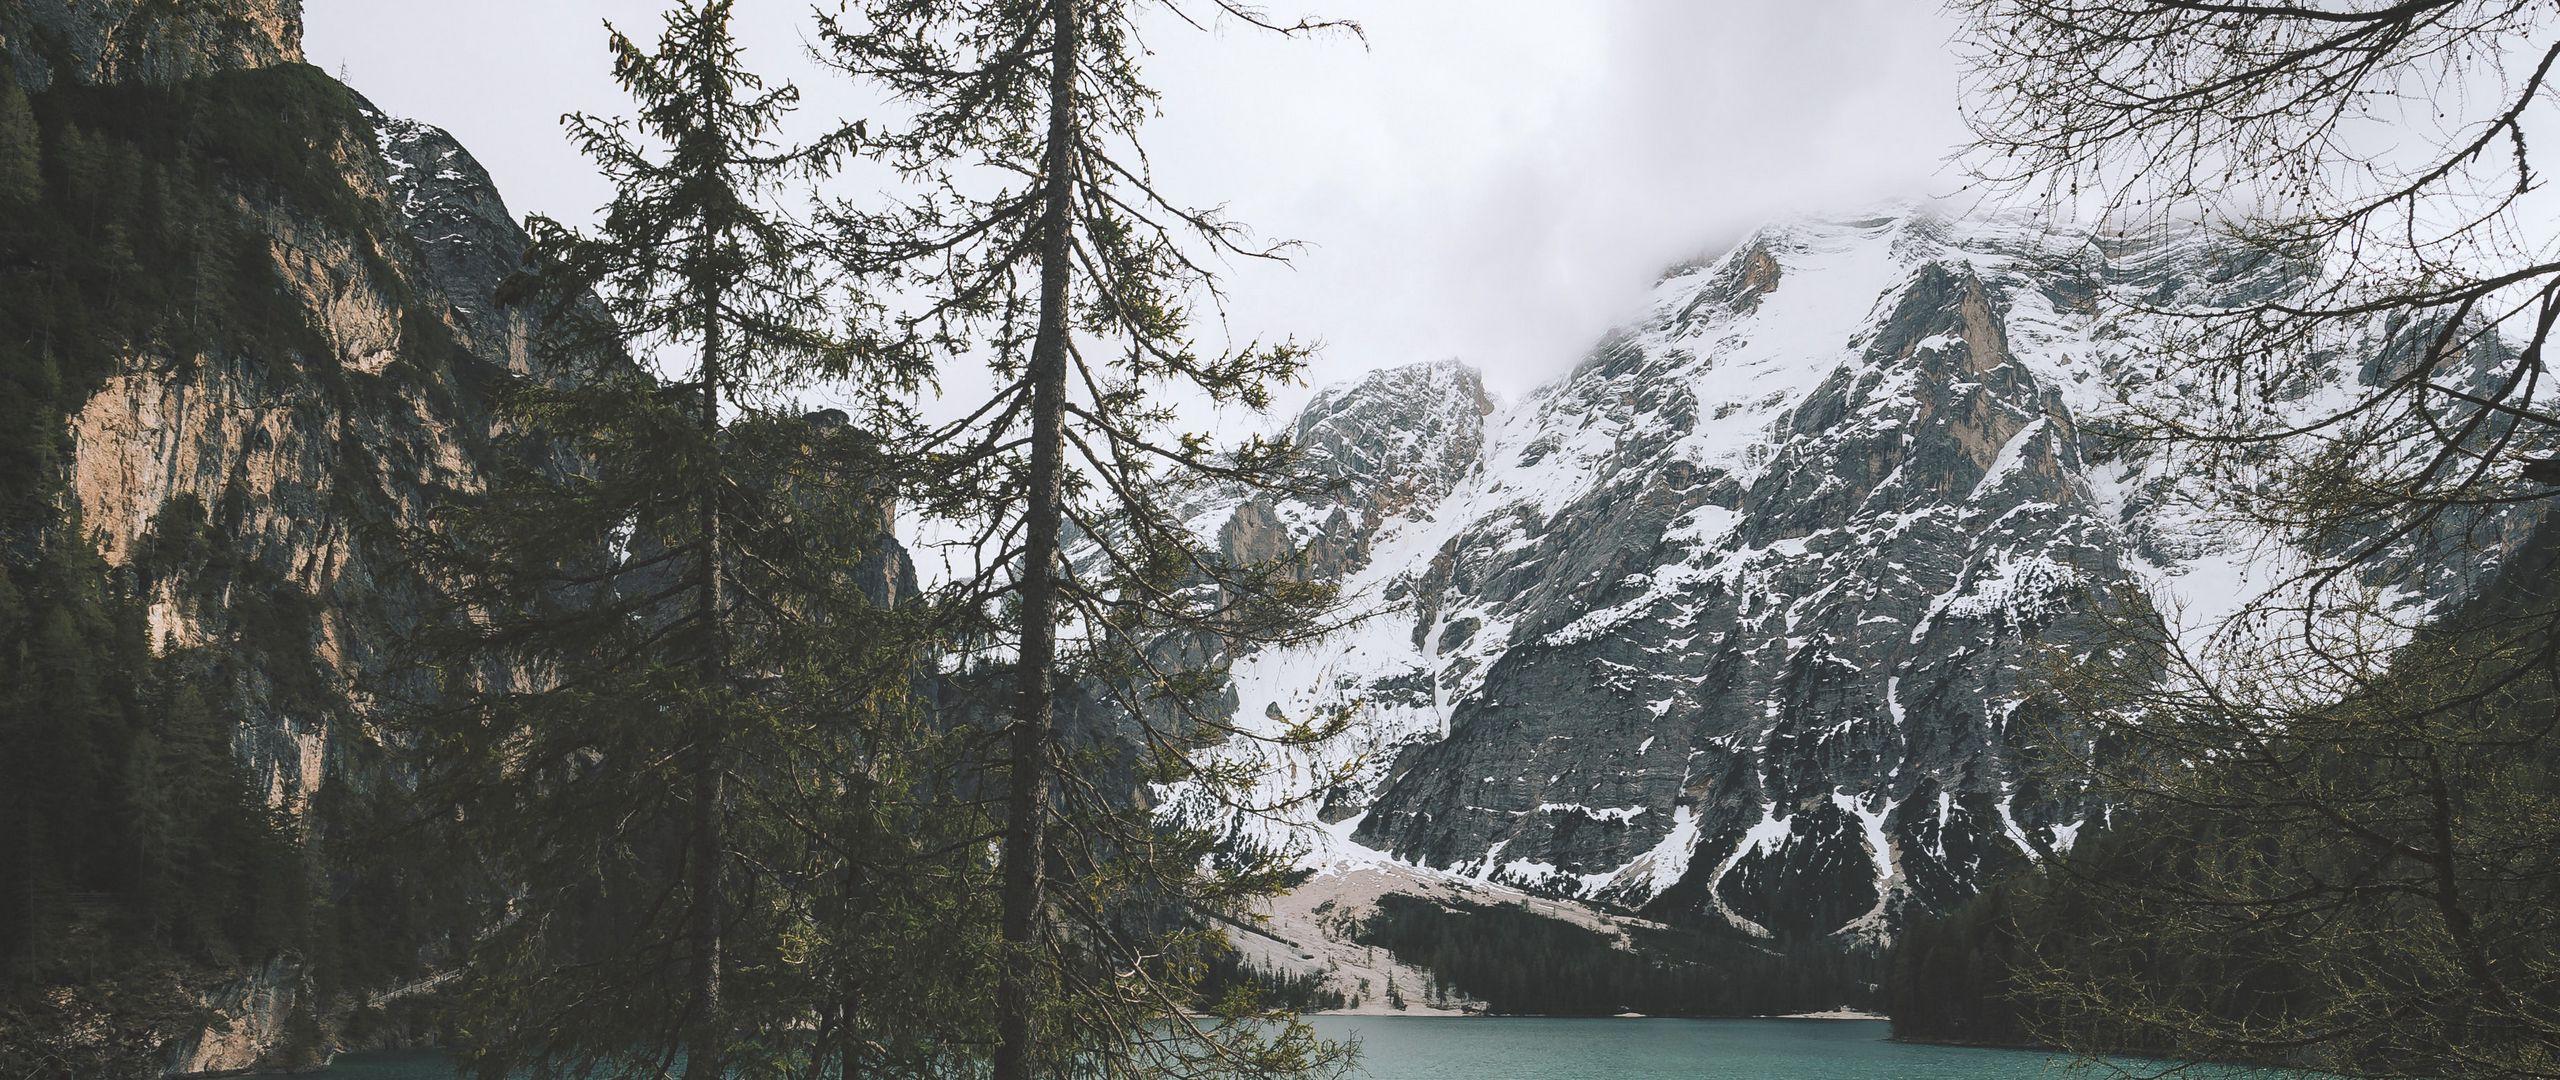 2560x1080 Wallpaper mountains, coast, peace